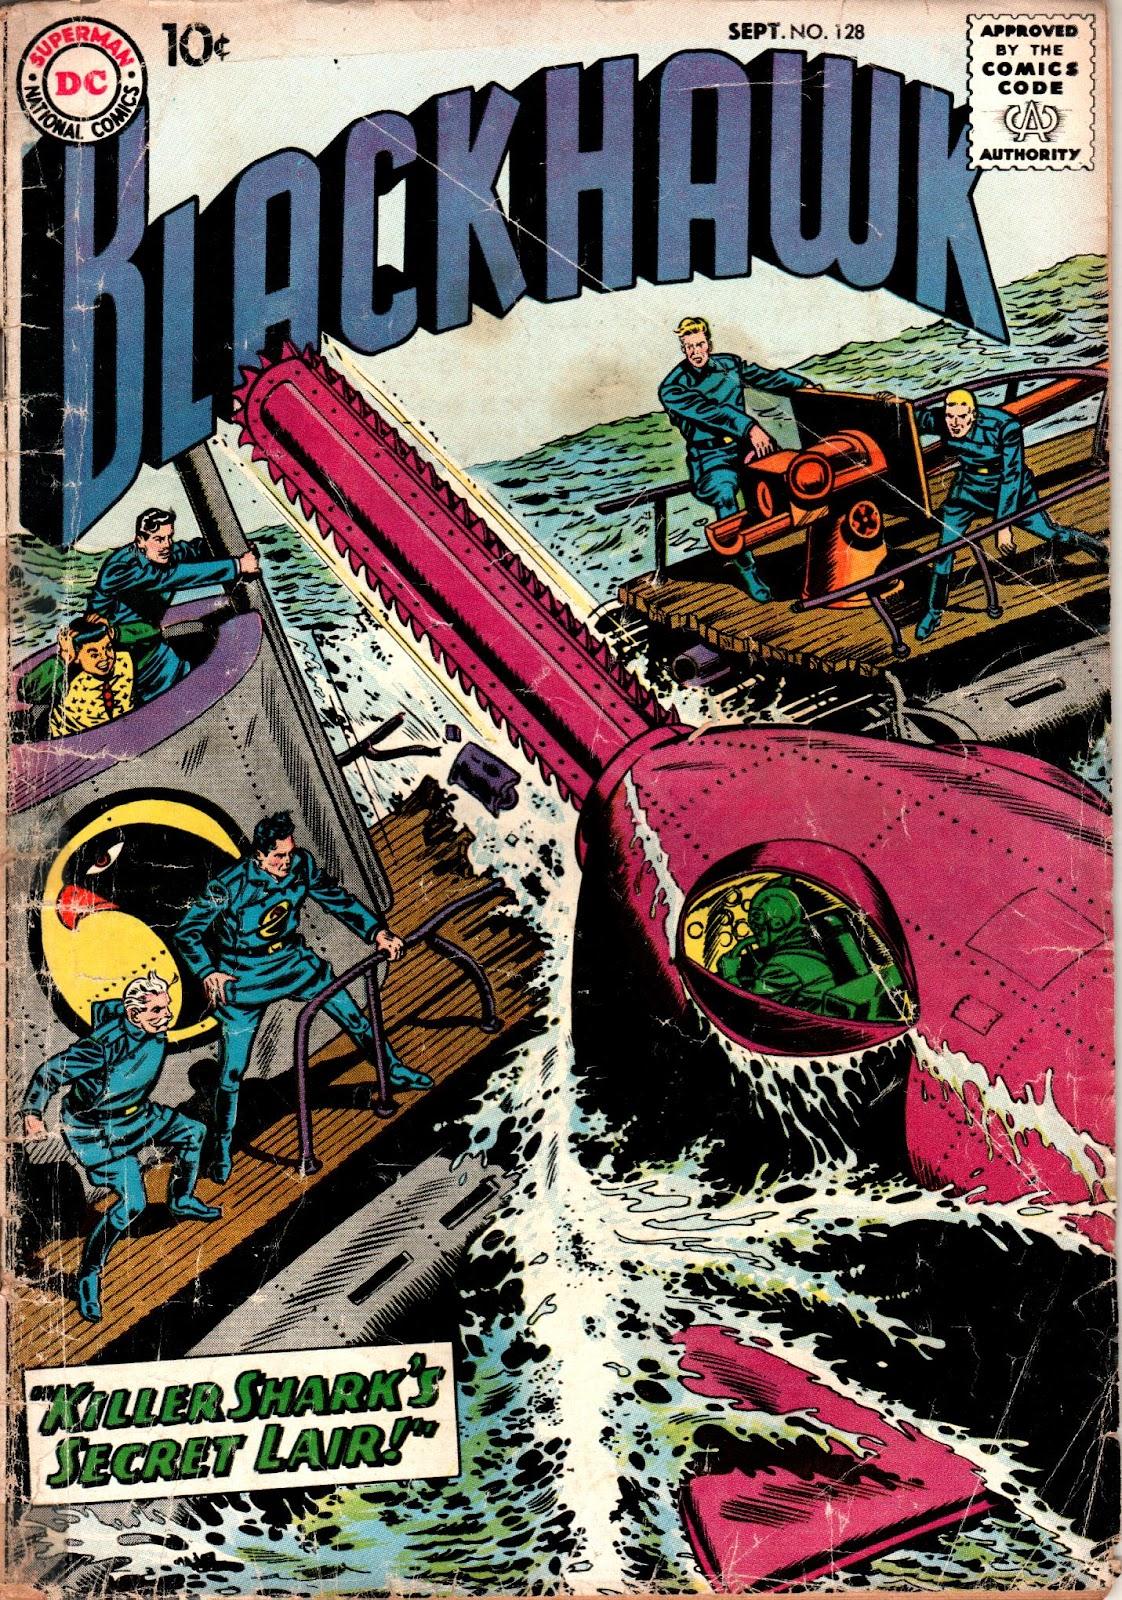 Blackhawk (1957) Issue #128 #21 - English 1